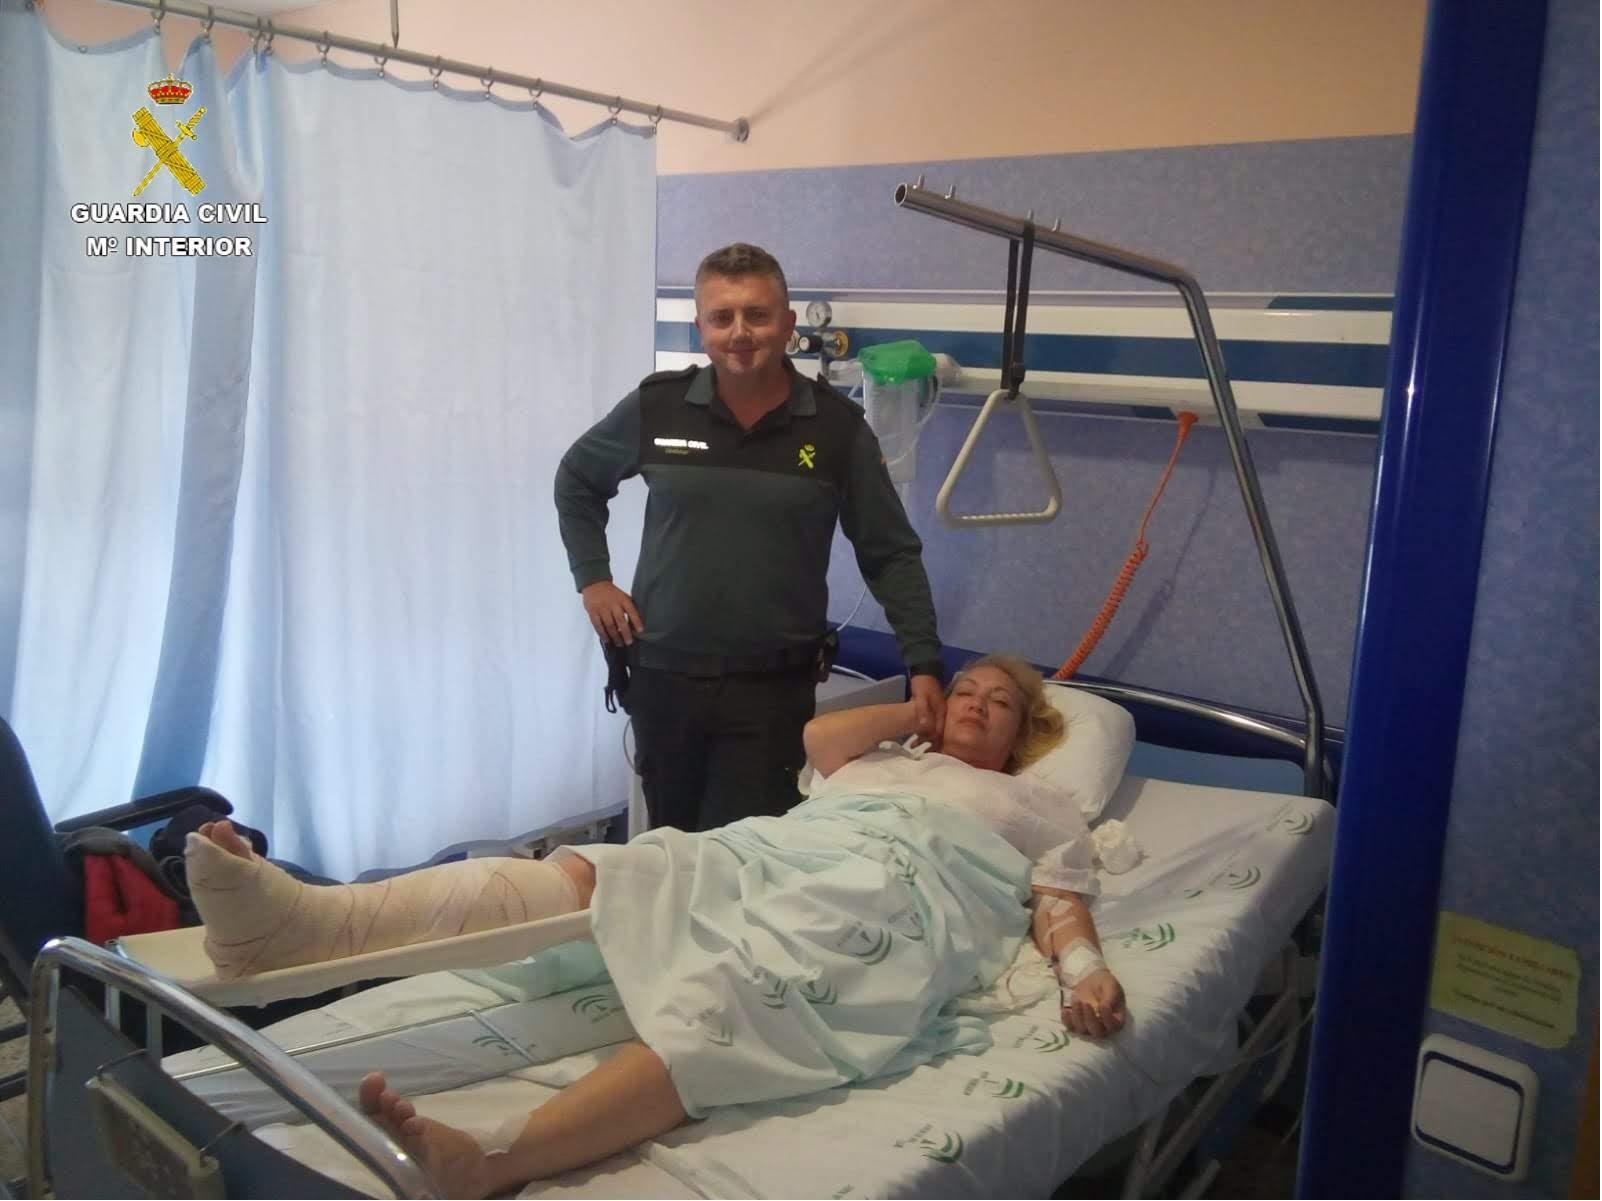 La Guardia Civil salva la vida de una mujer herida en Bolonia